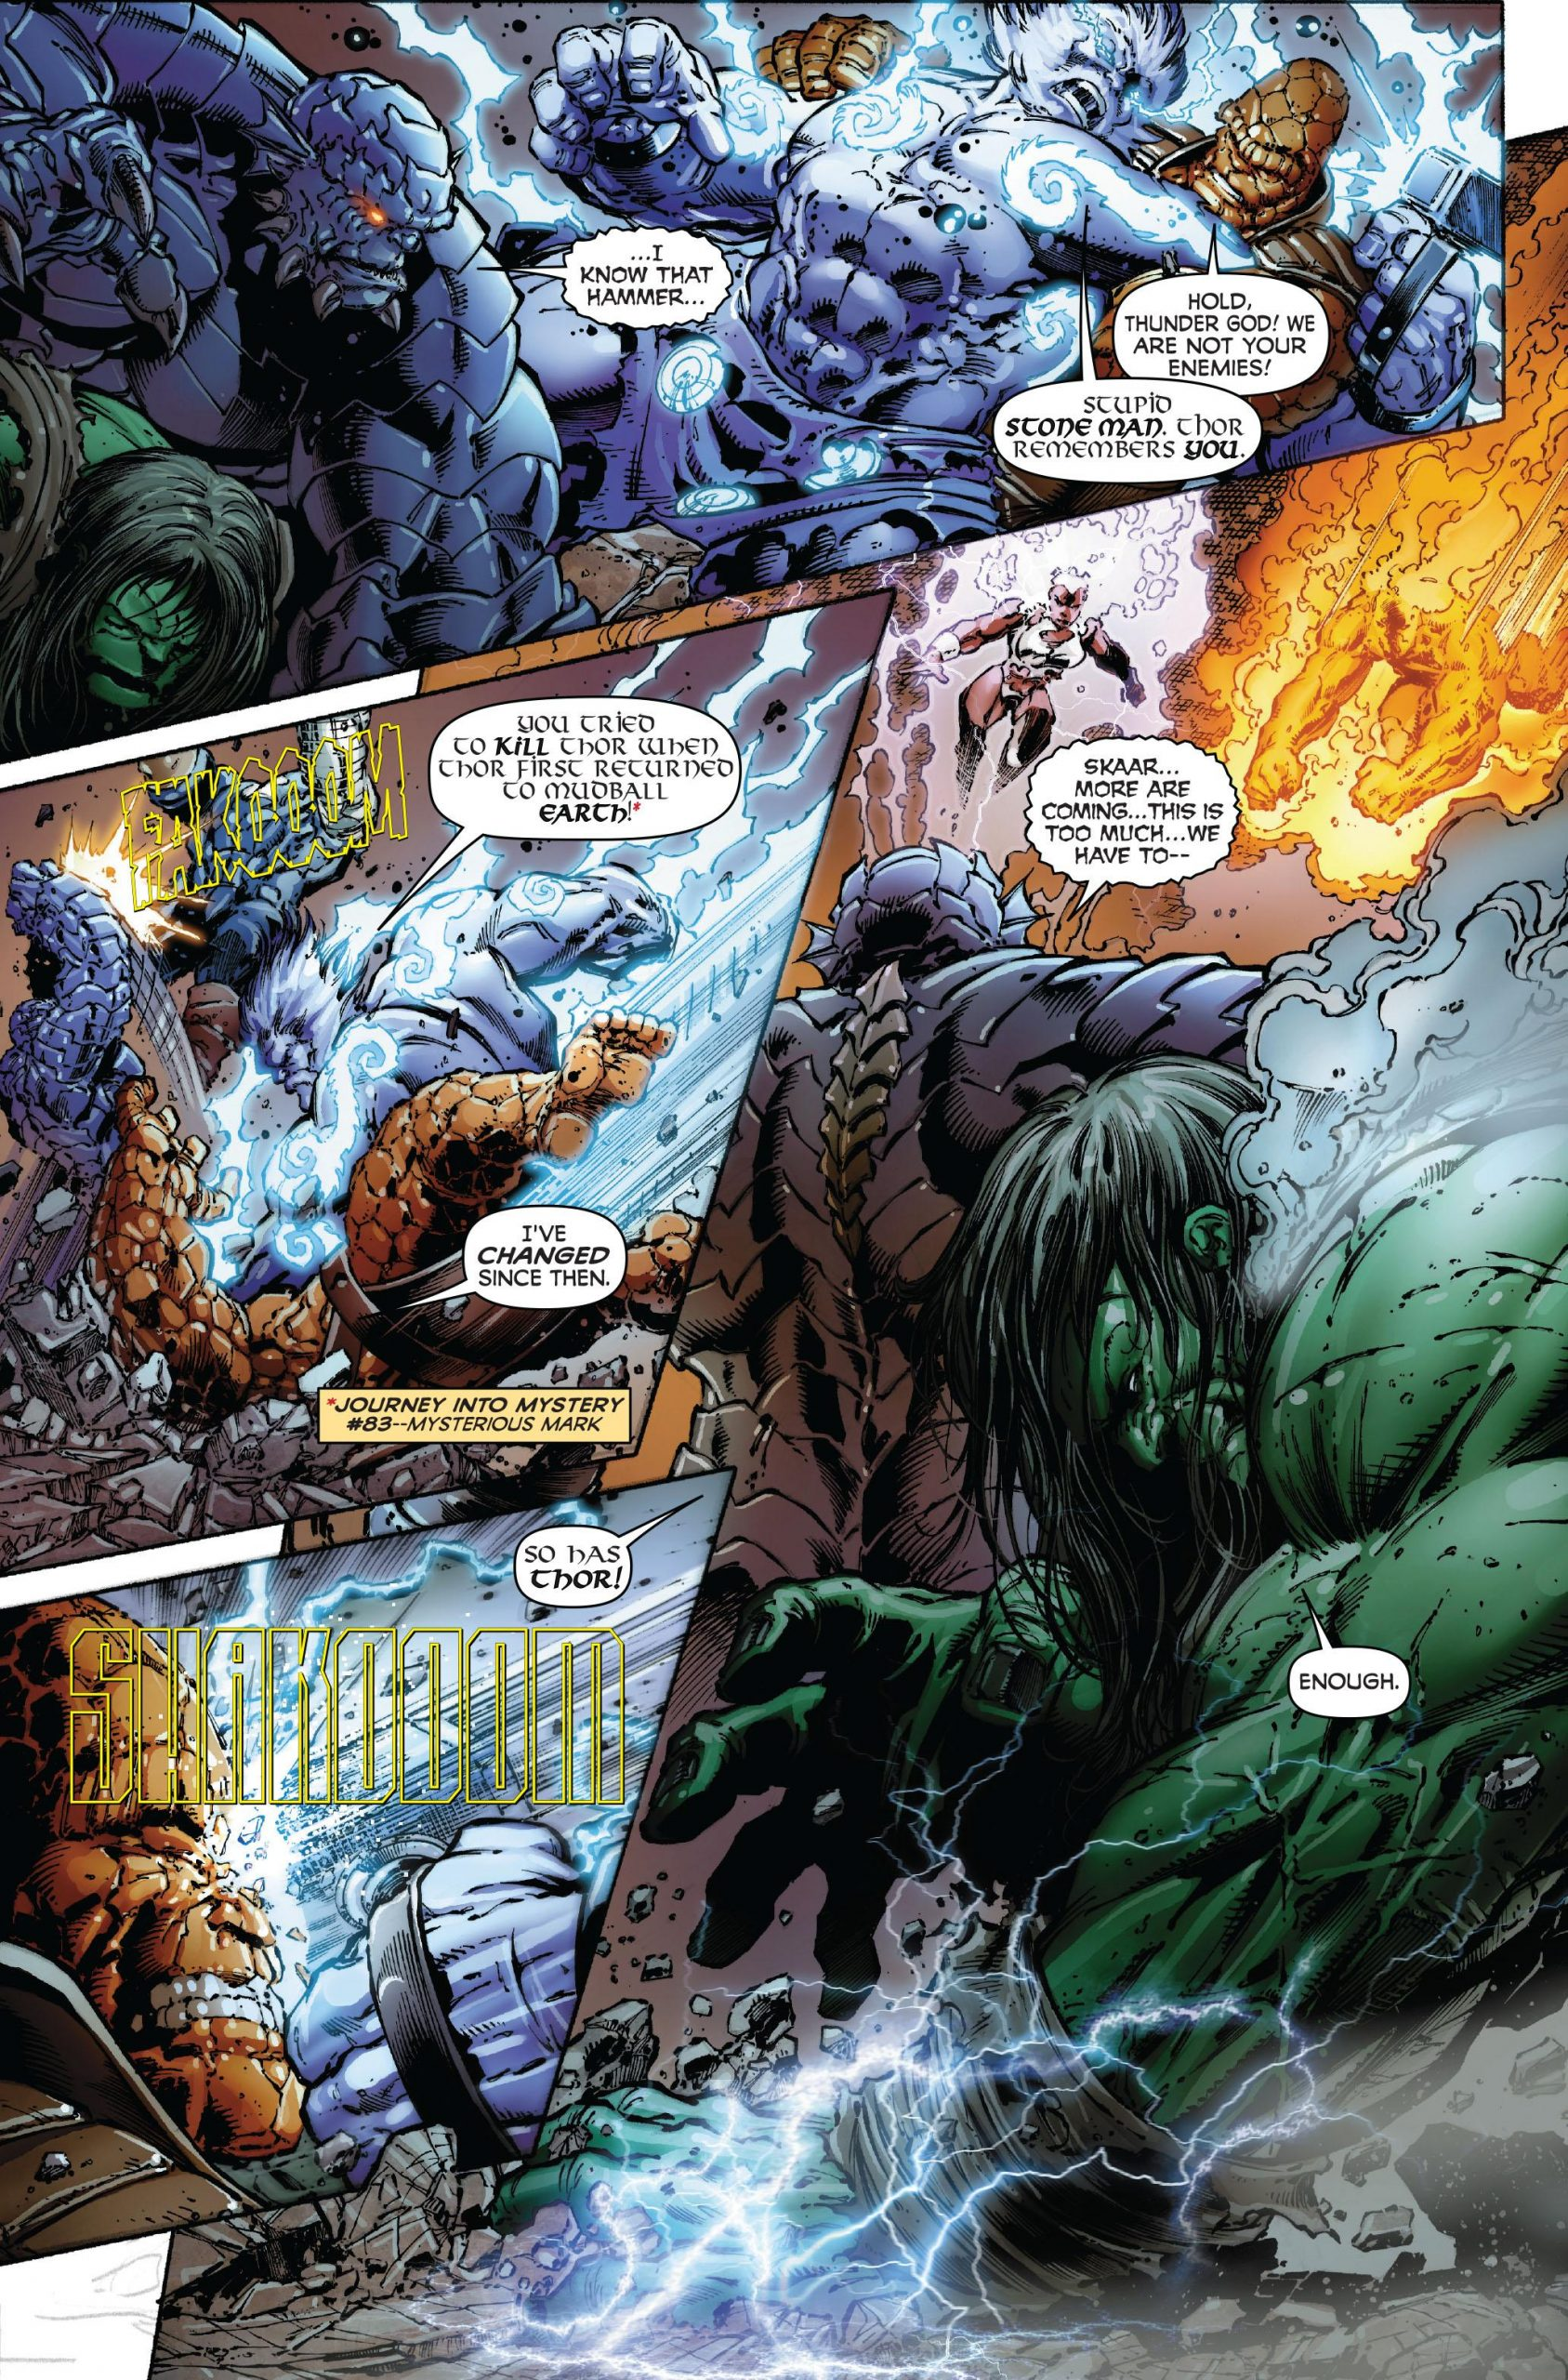 Incredible Hulk - World War Hulks review